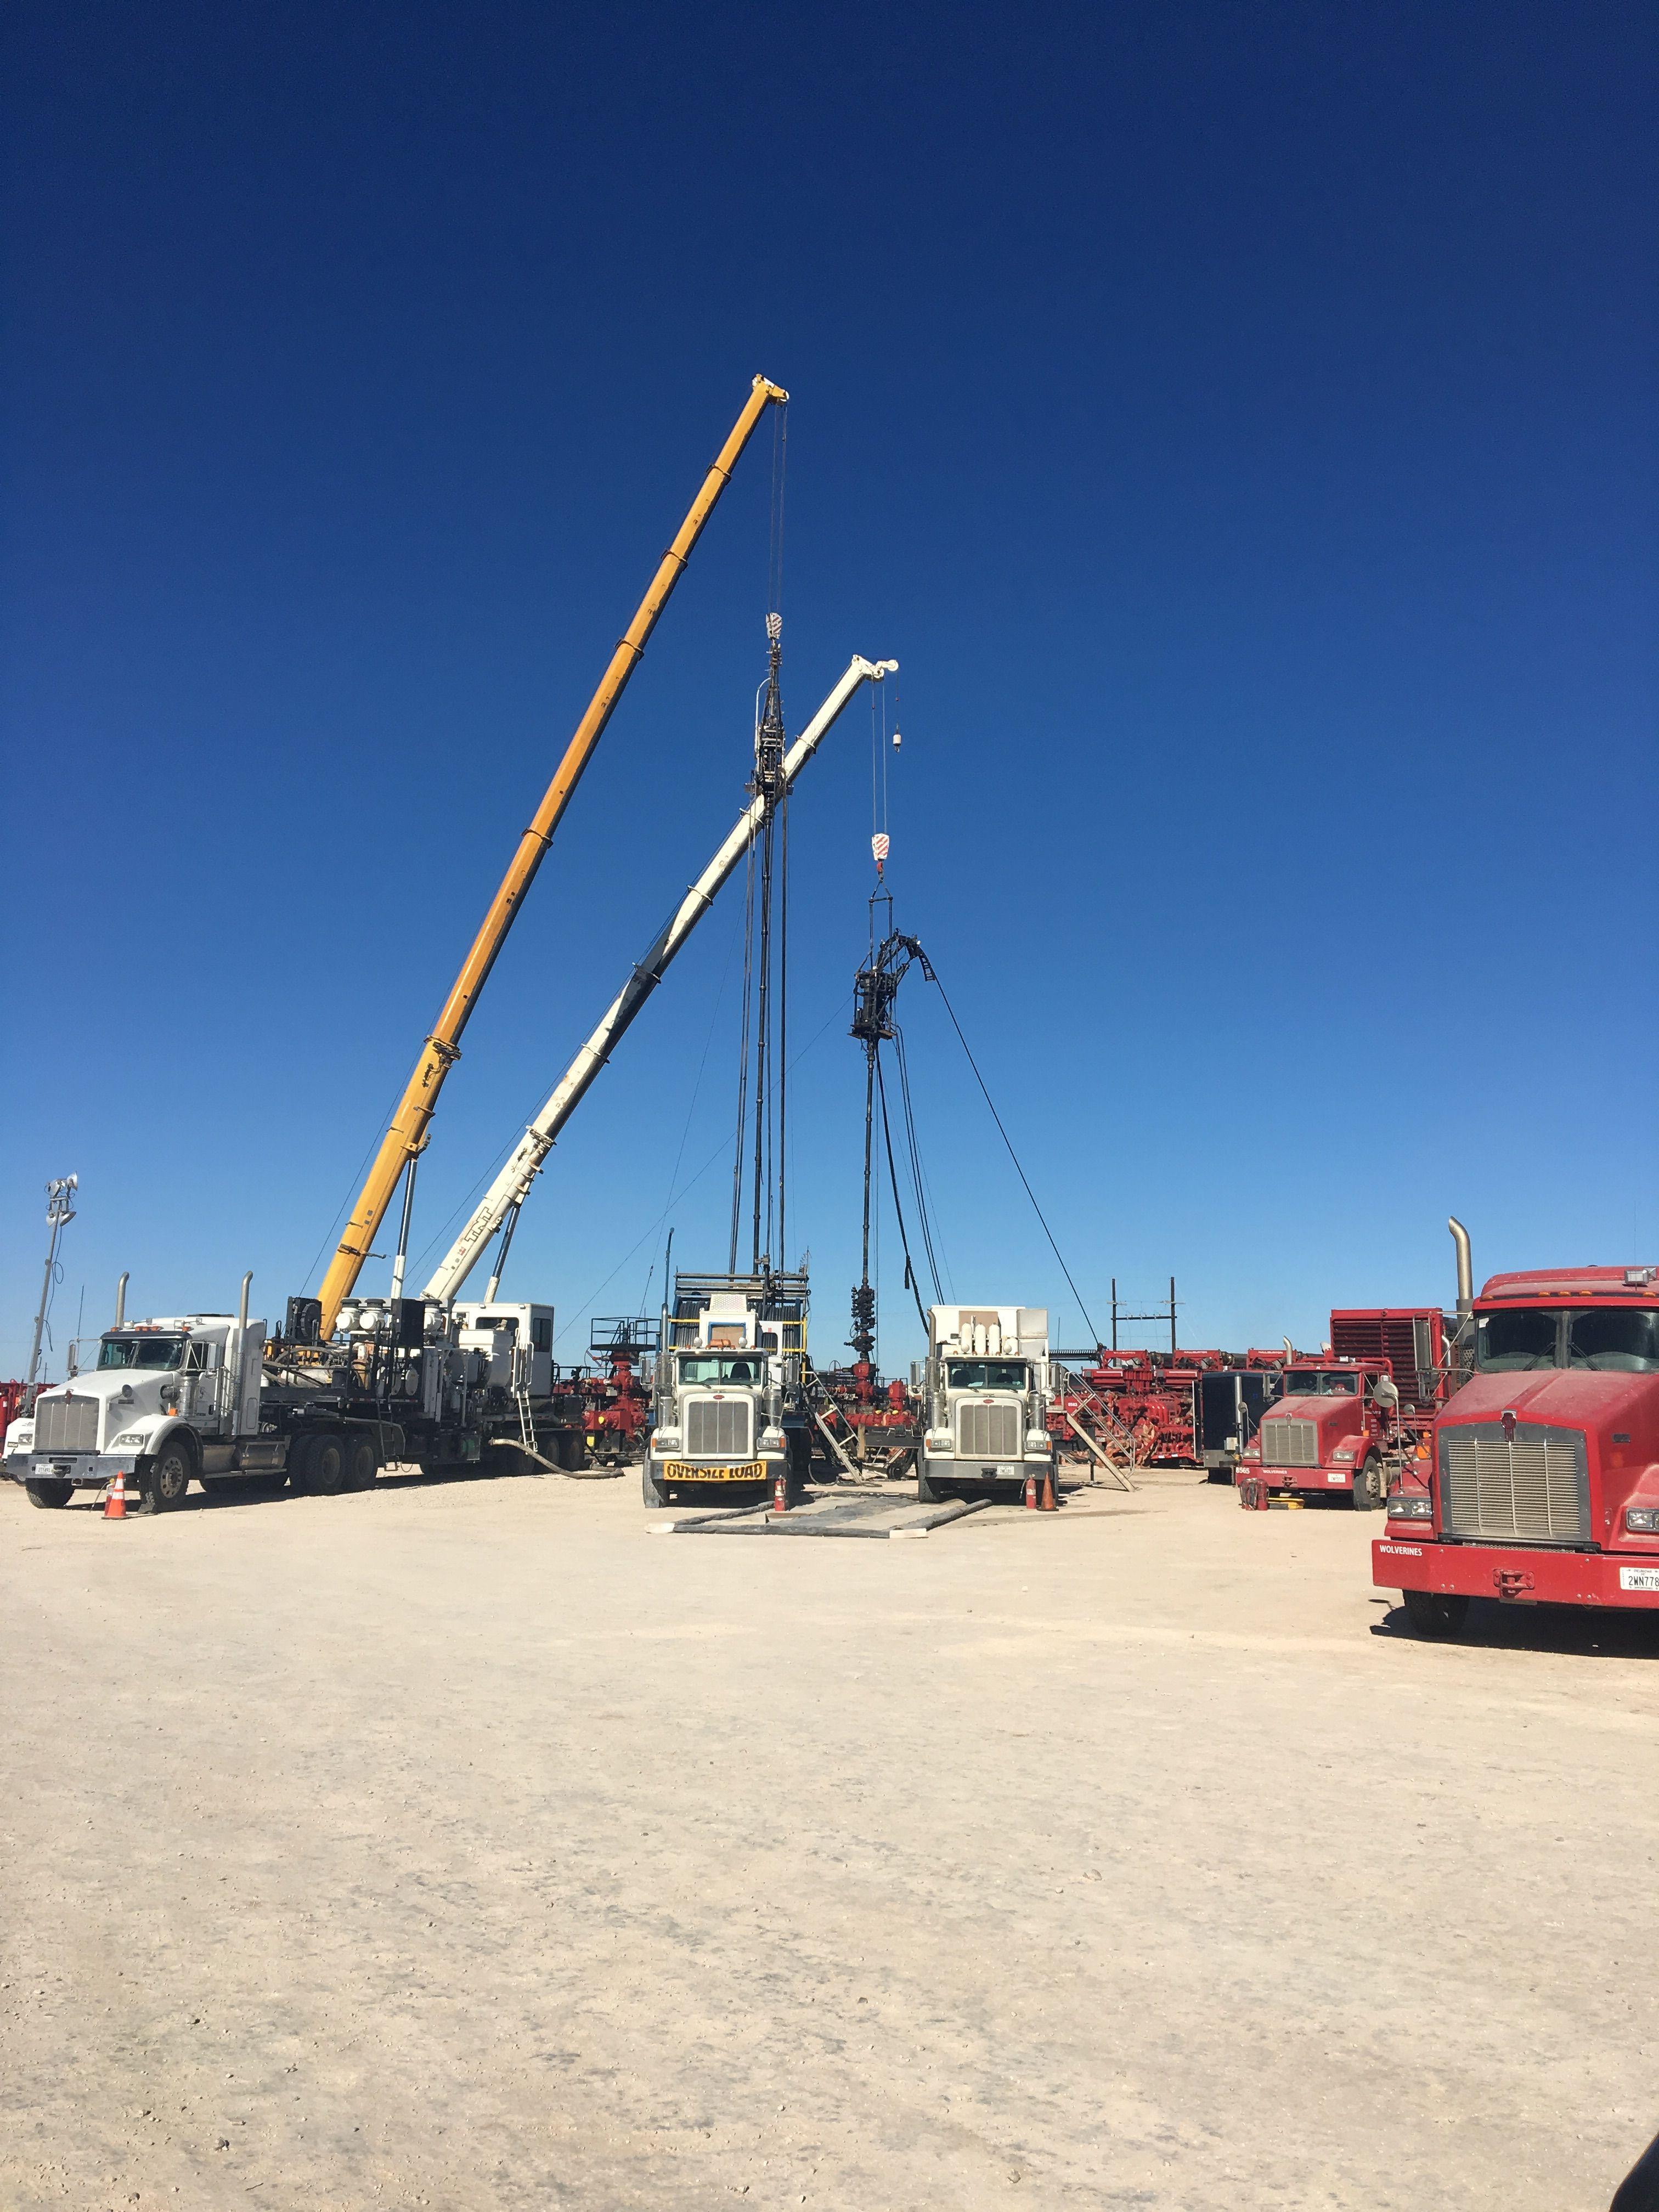 Double Fishing Job South Of Midland Tx Oilfield Midland Travel